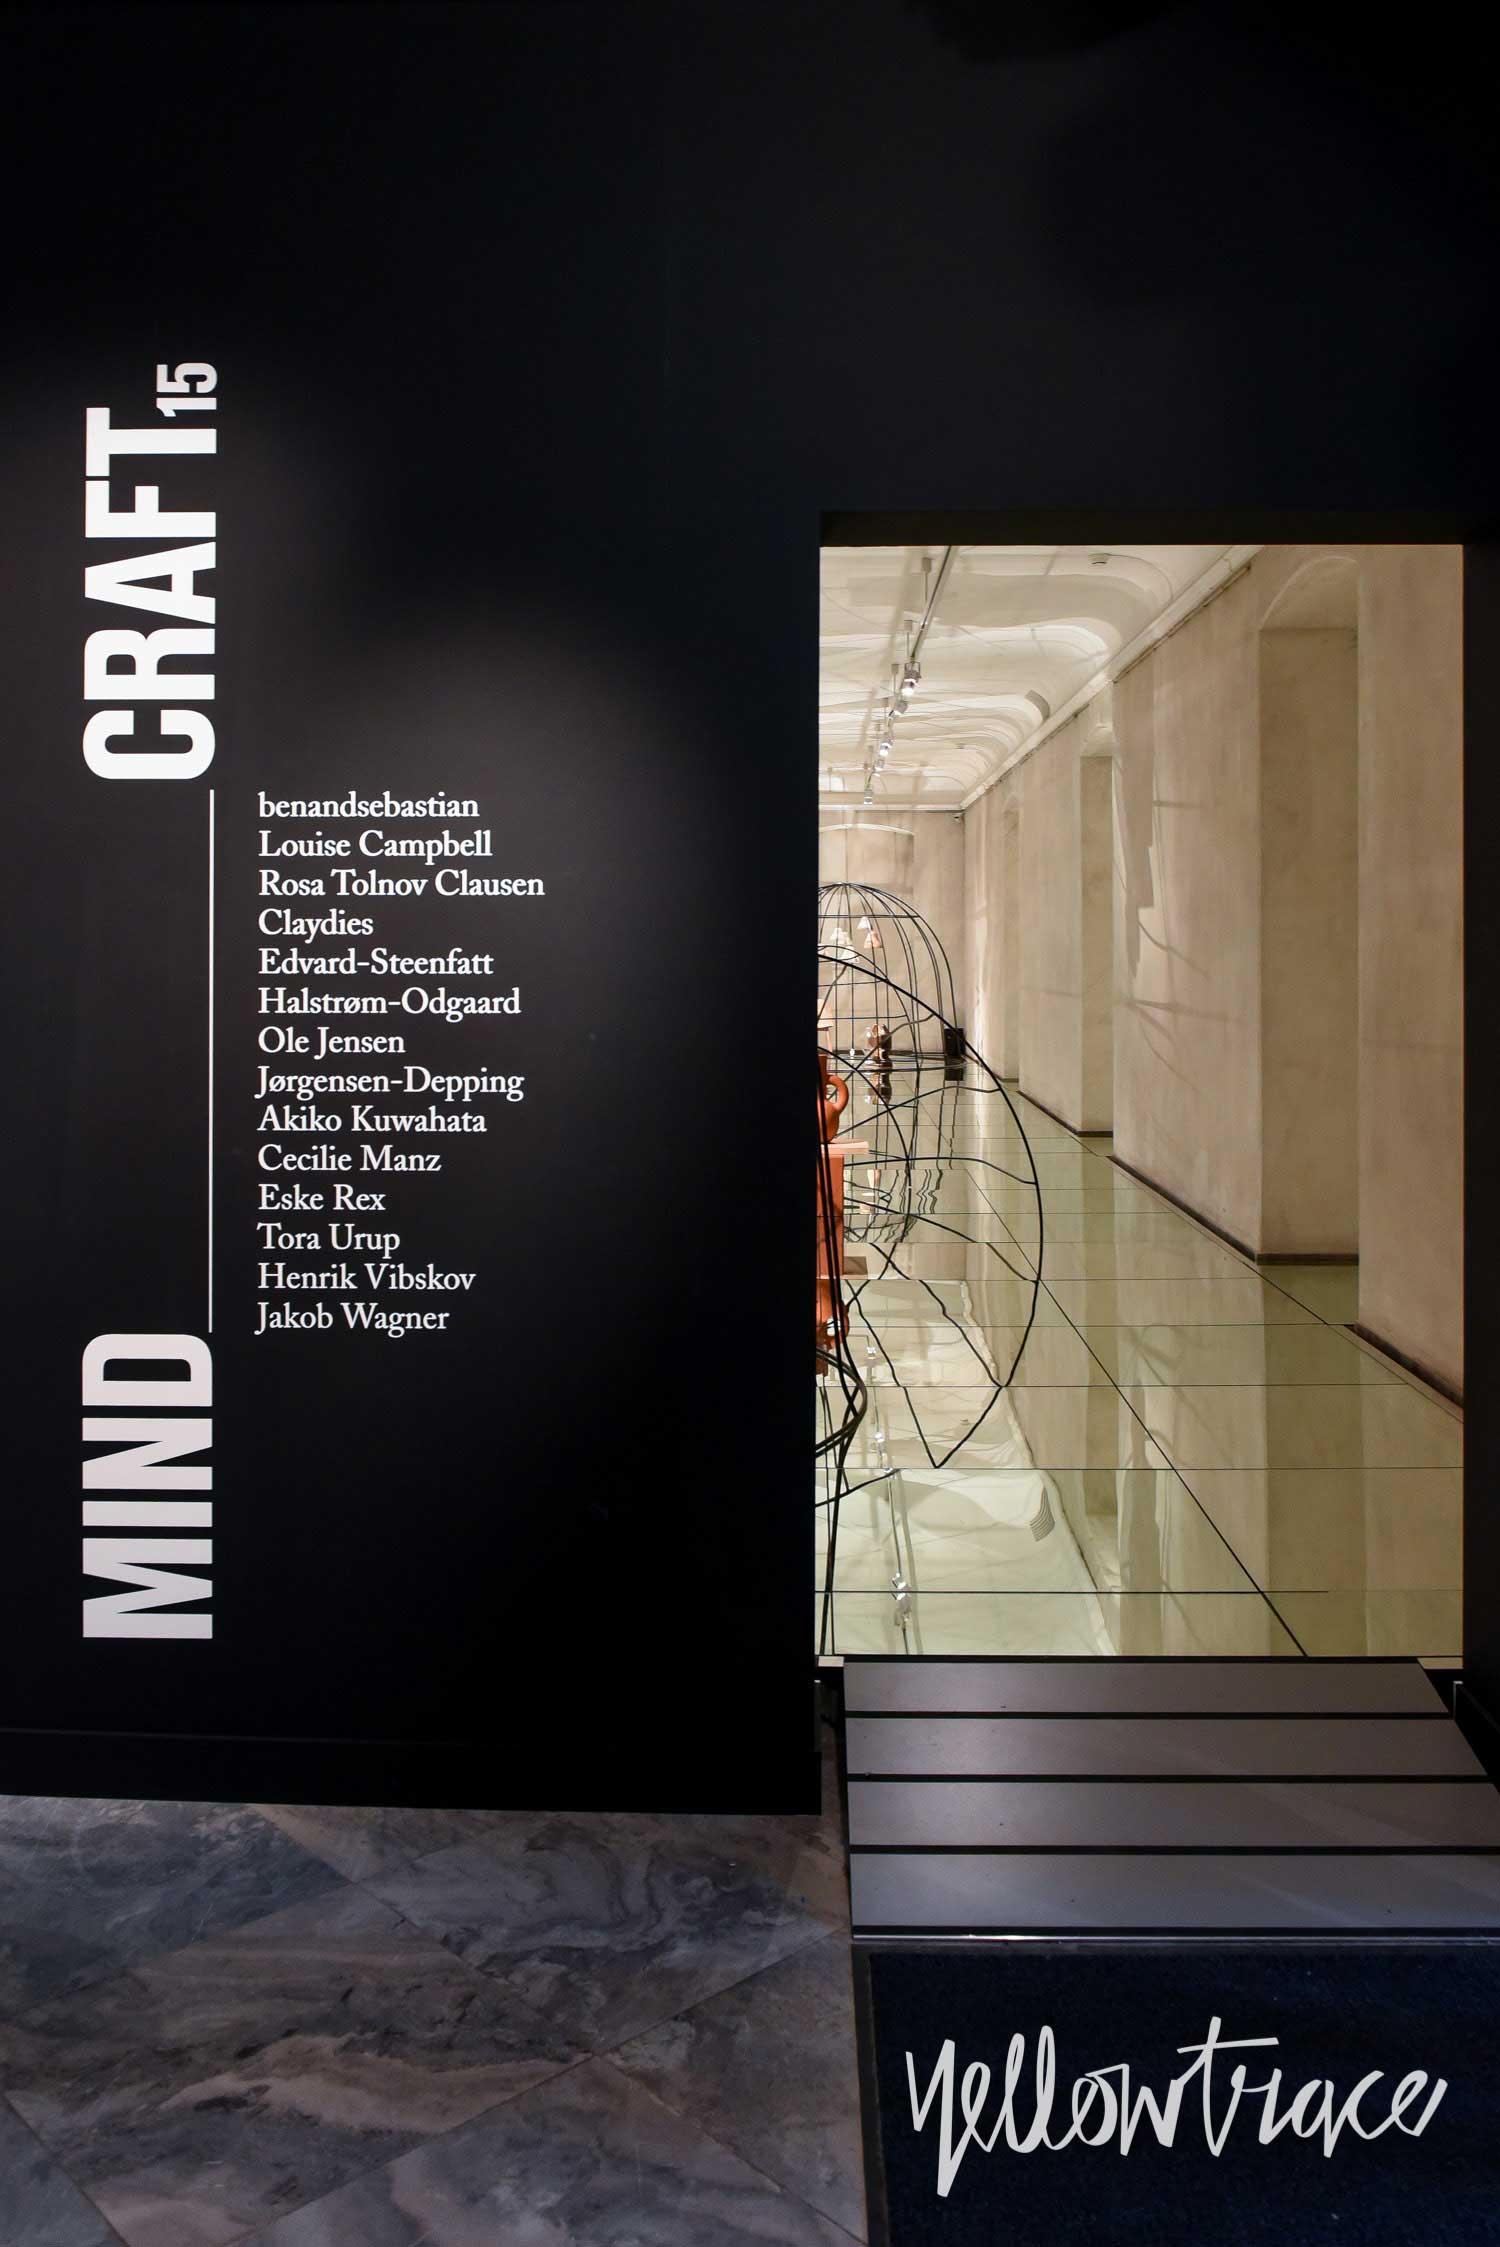 MINDCRAFT Exhibition by GamFratesi in Copenhagen, Photo ©Nick Hughes | Yellowtrace